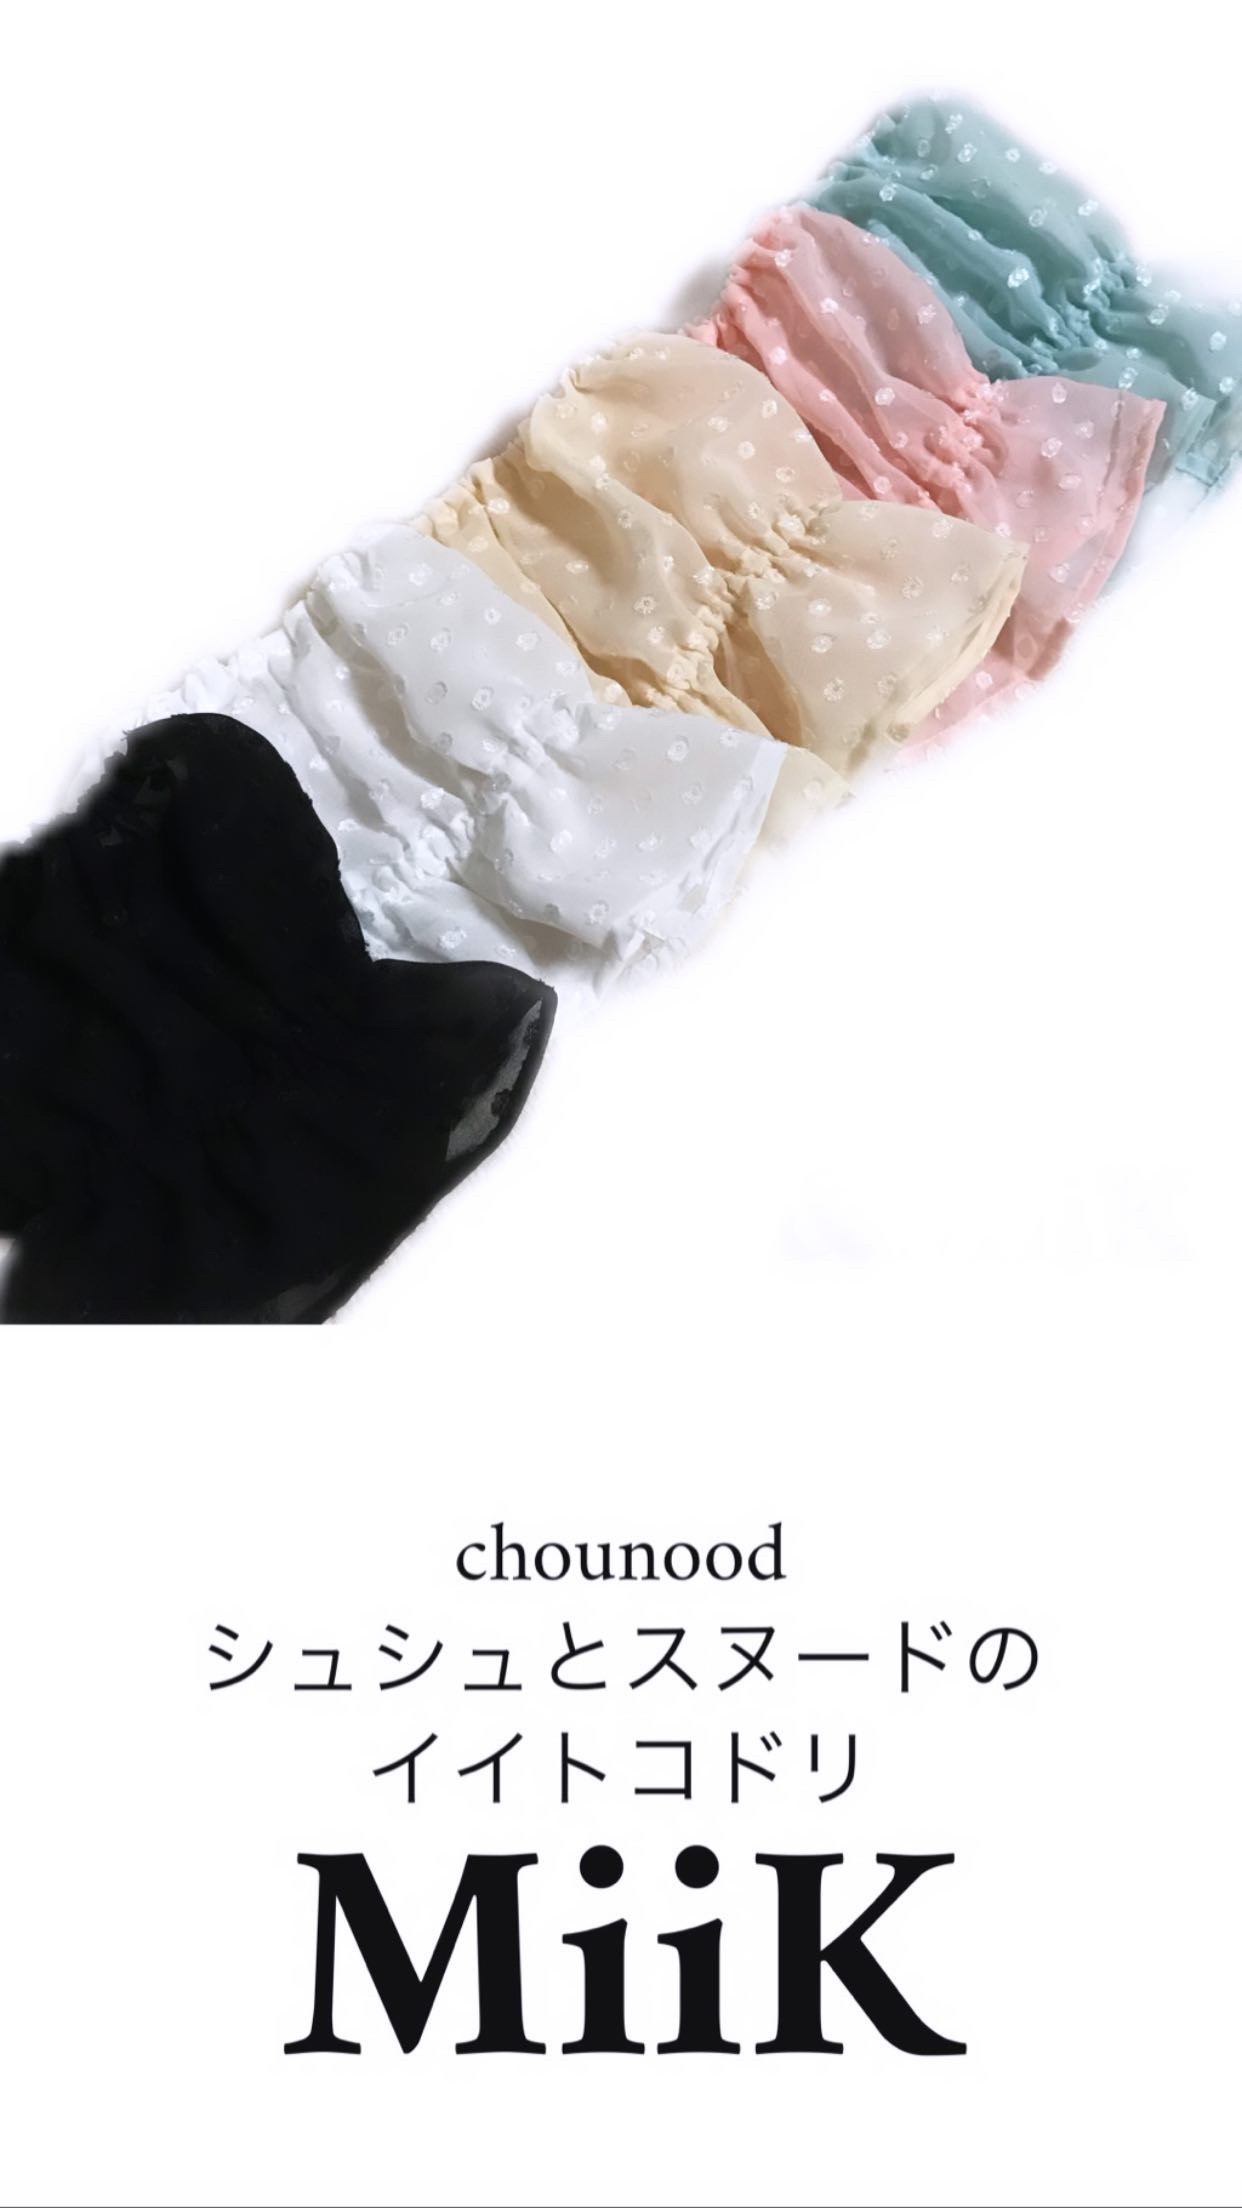 MiiKオリジナル chounood シュヌード シュシュ スヌード